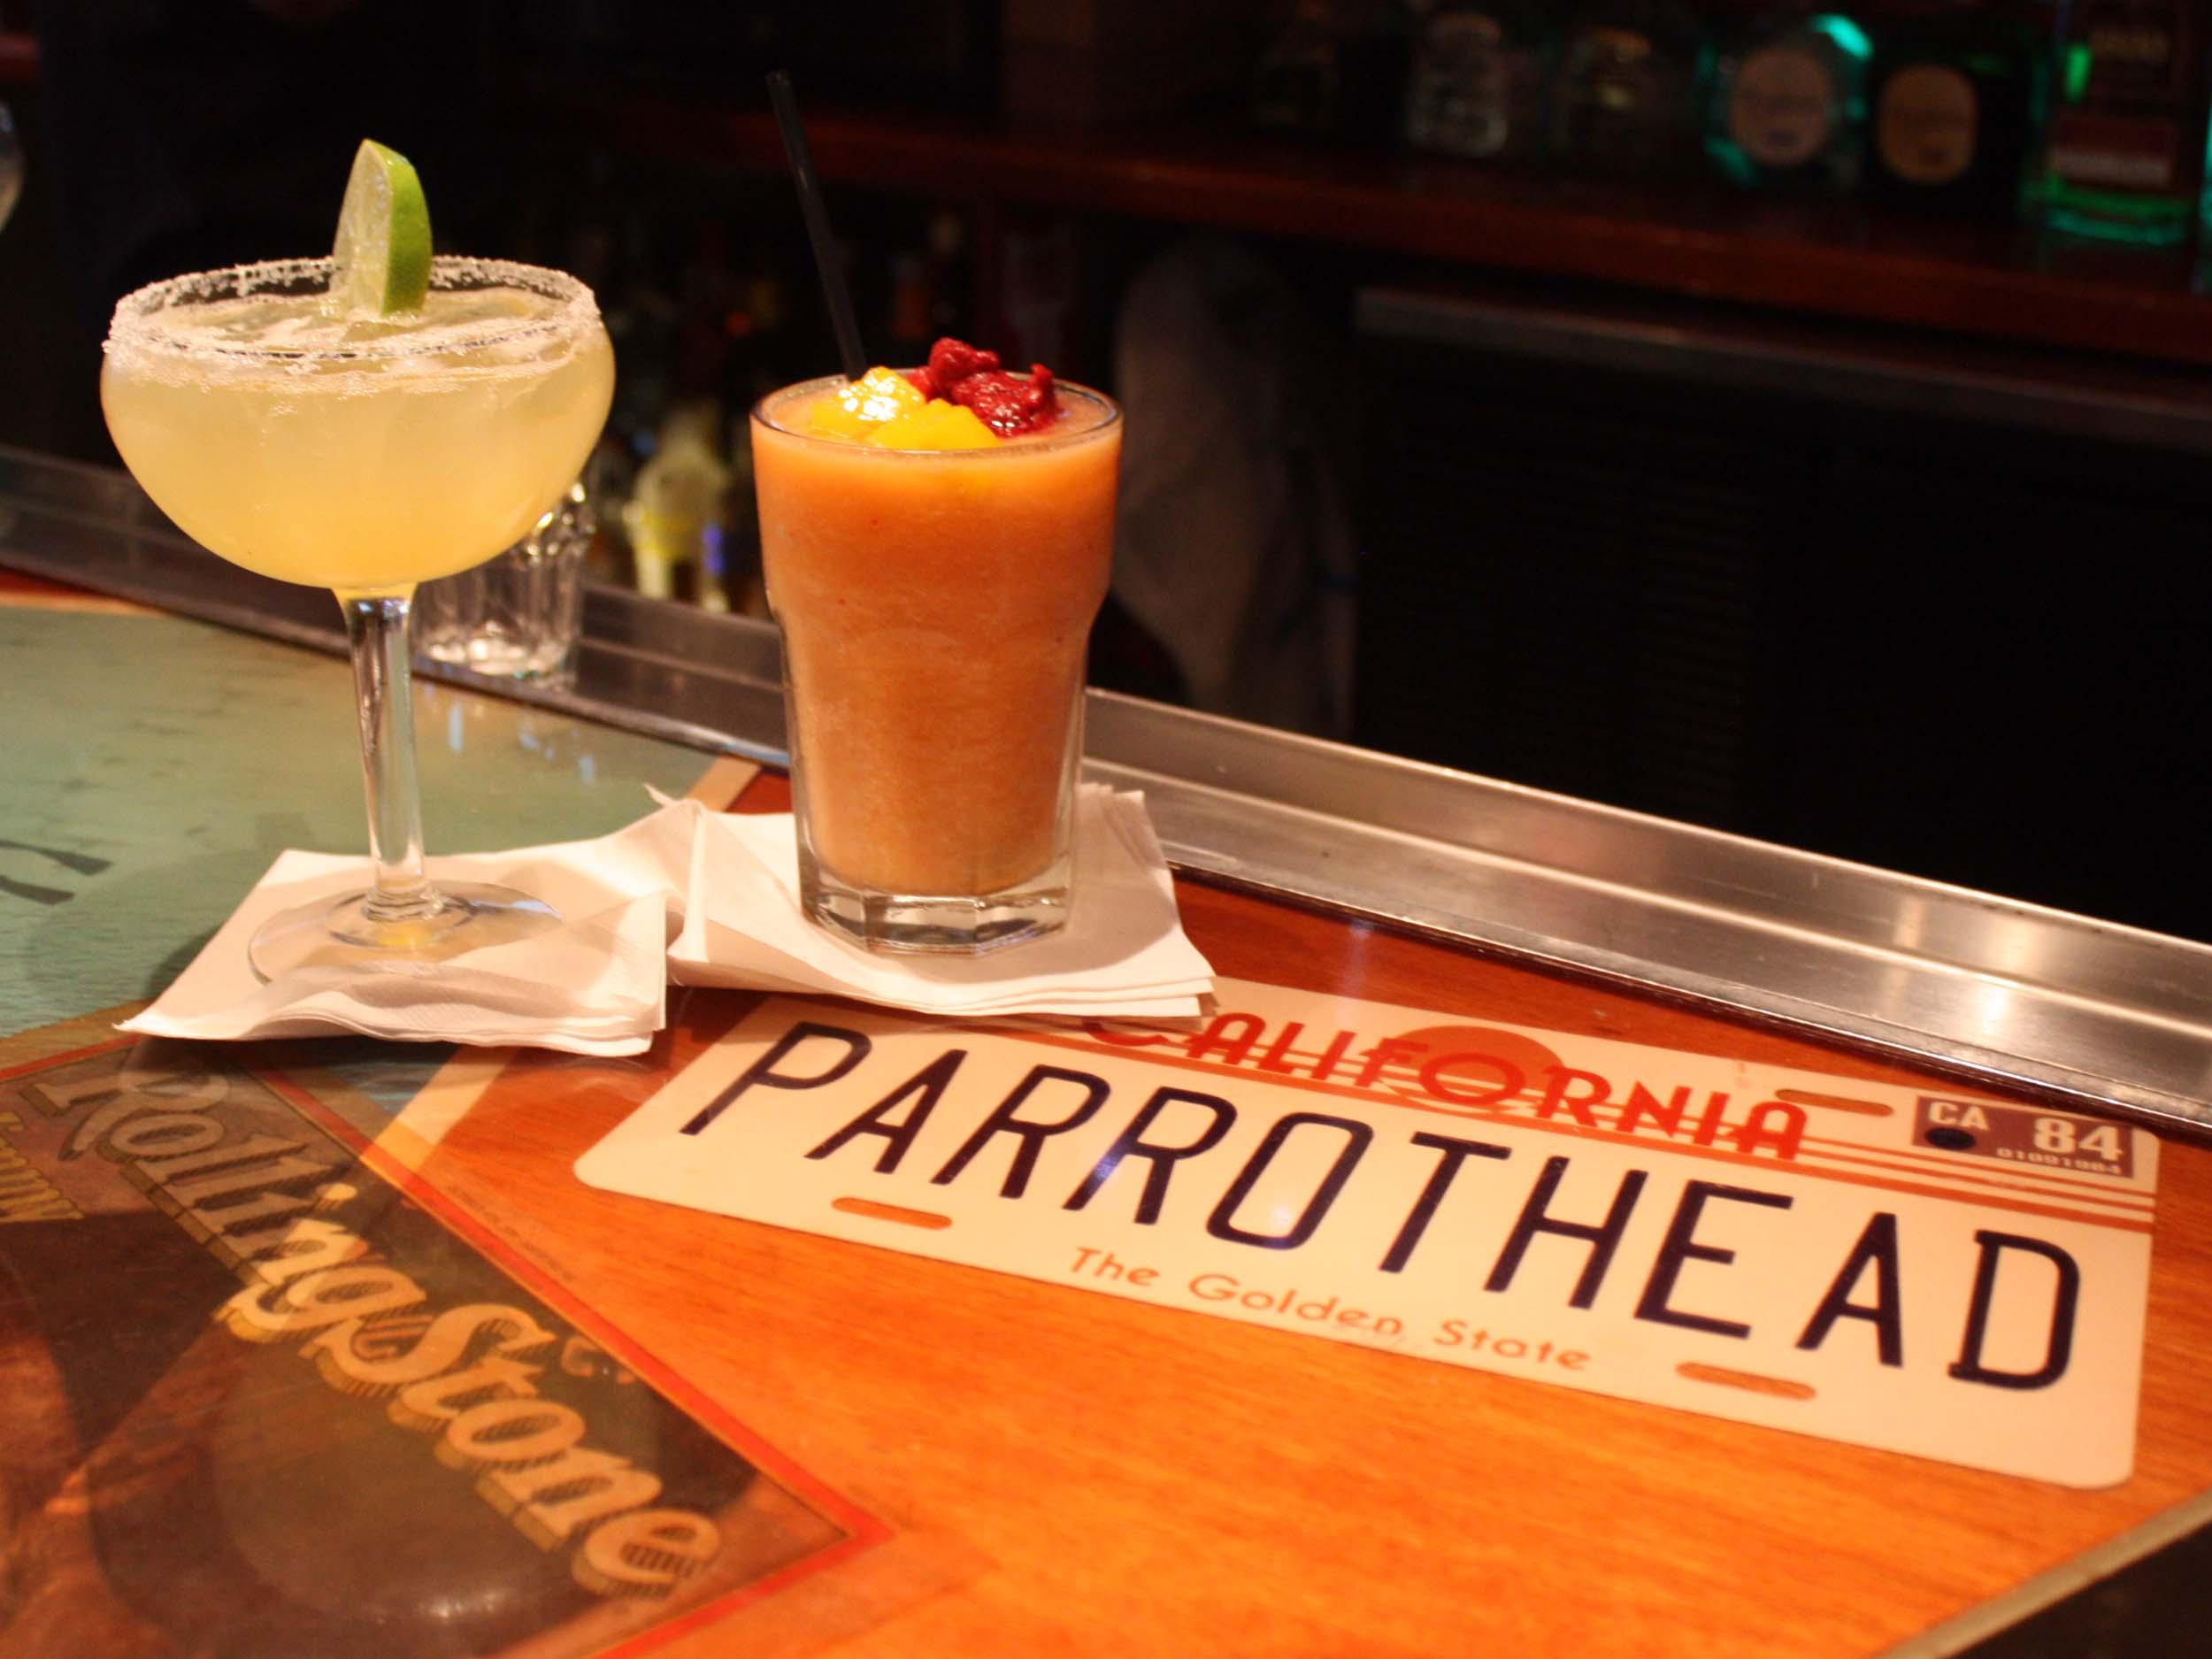 Jimmy Buffett's Margaritaville Boat Drinks